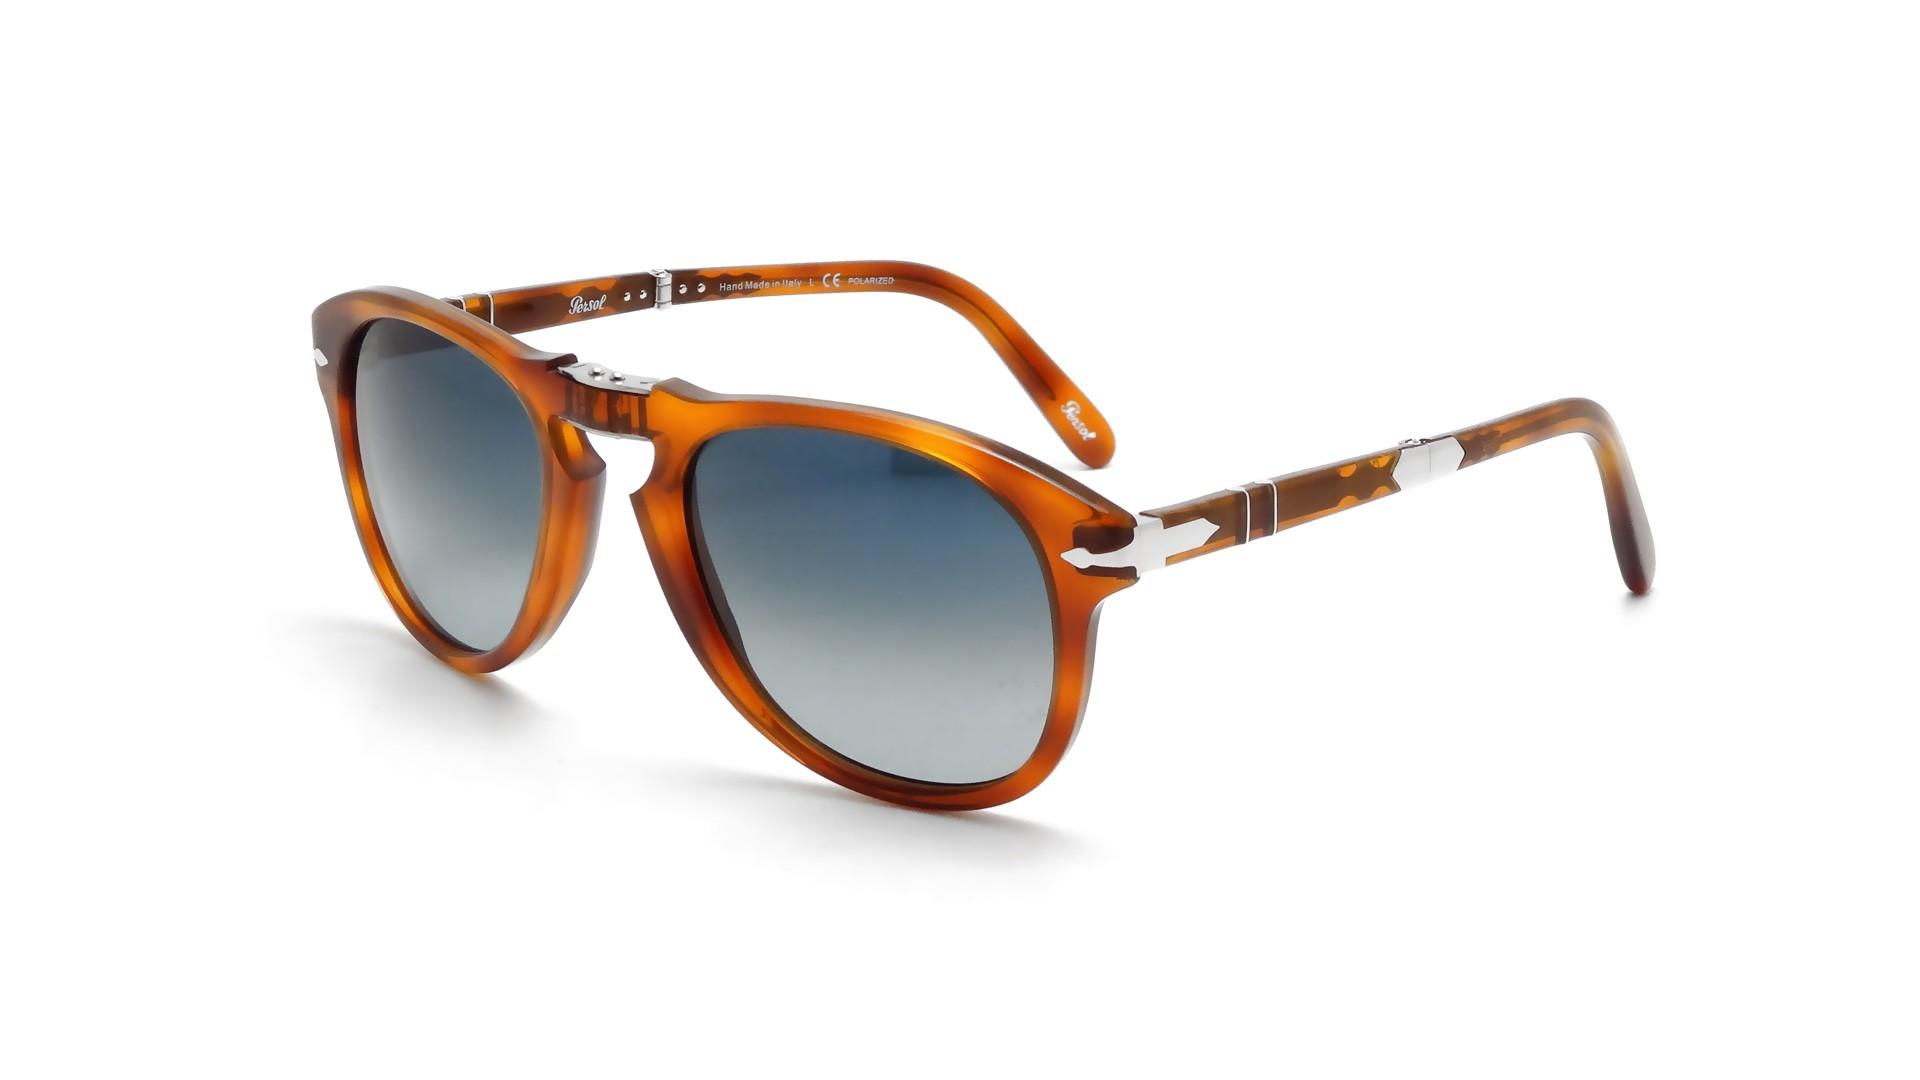 641a1a90398 Sunglasses Persol Steve McQueen Havane Tortoise PO0714SM 96S3 52-21 Medium  Polarized Gradient